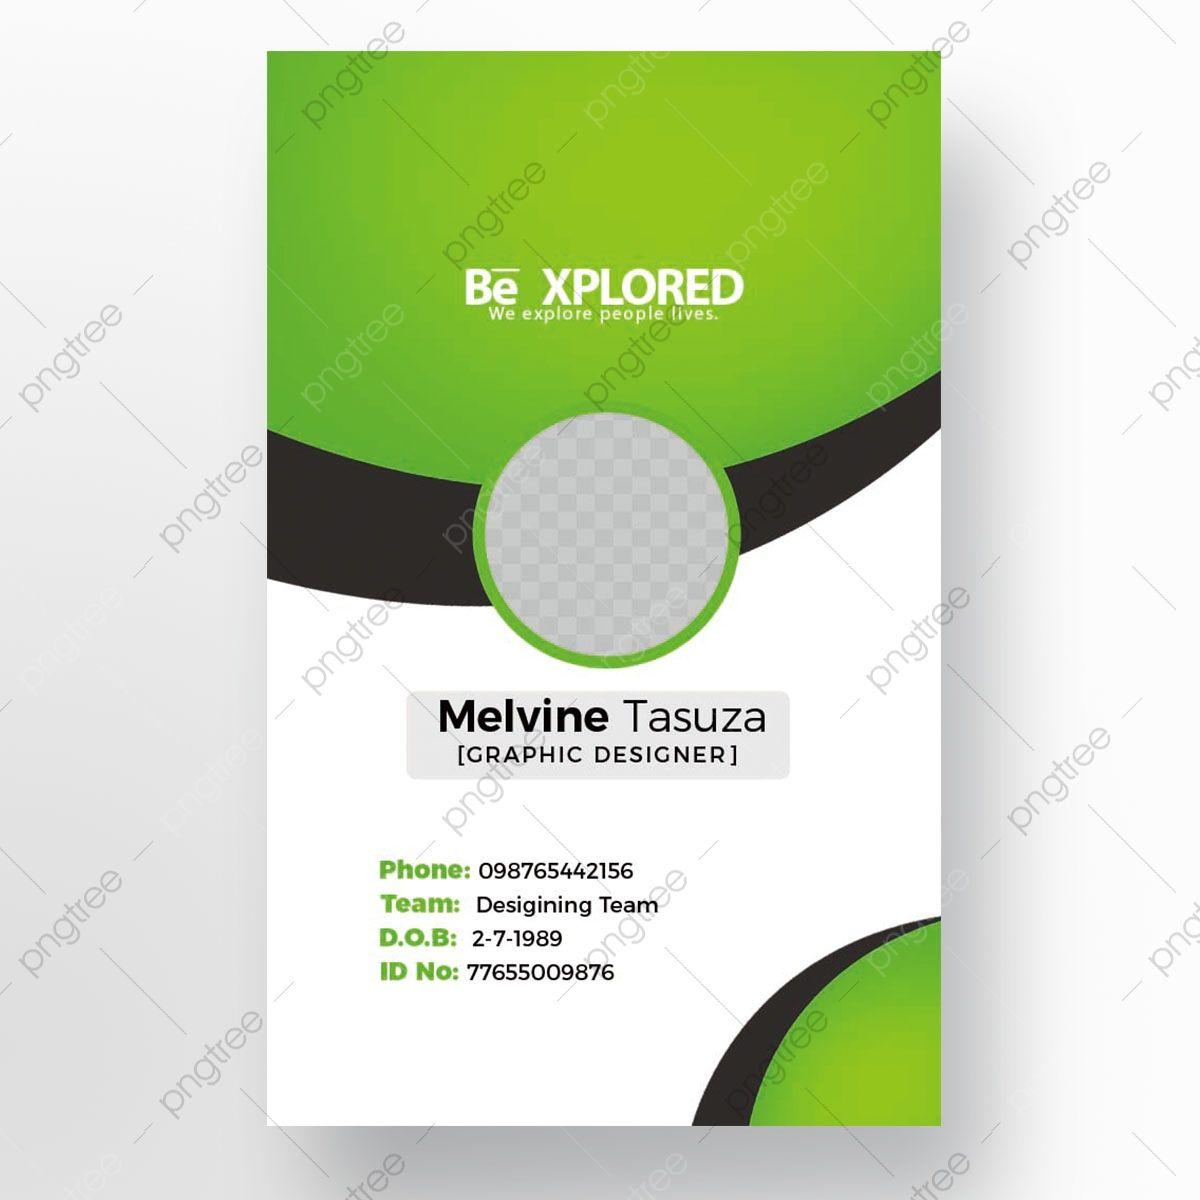 Professional Id Card Id Card Template Identity Card Design Blue Business Card